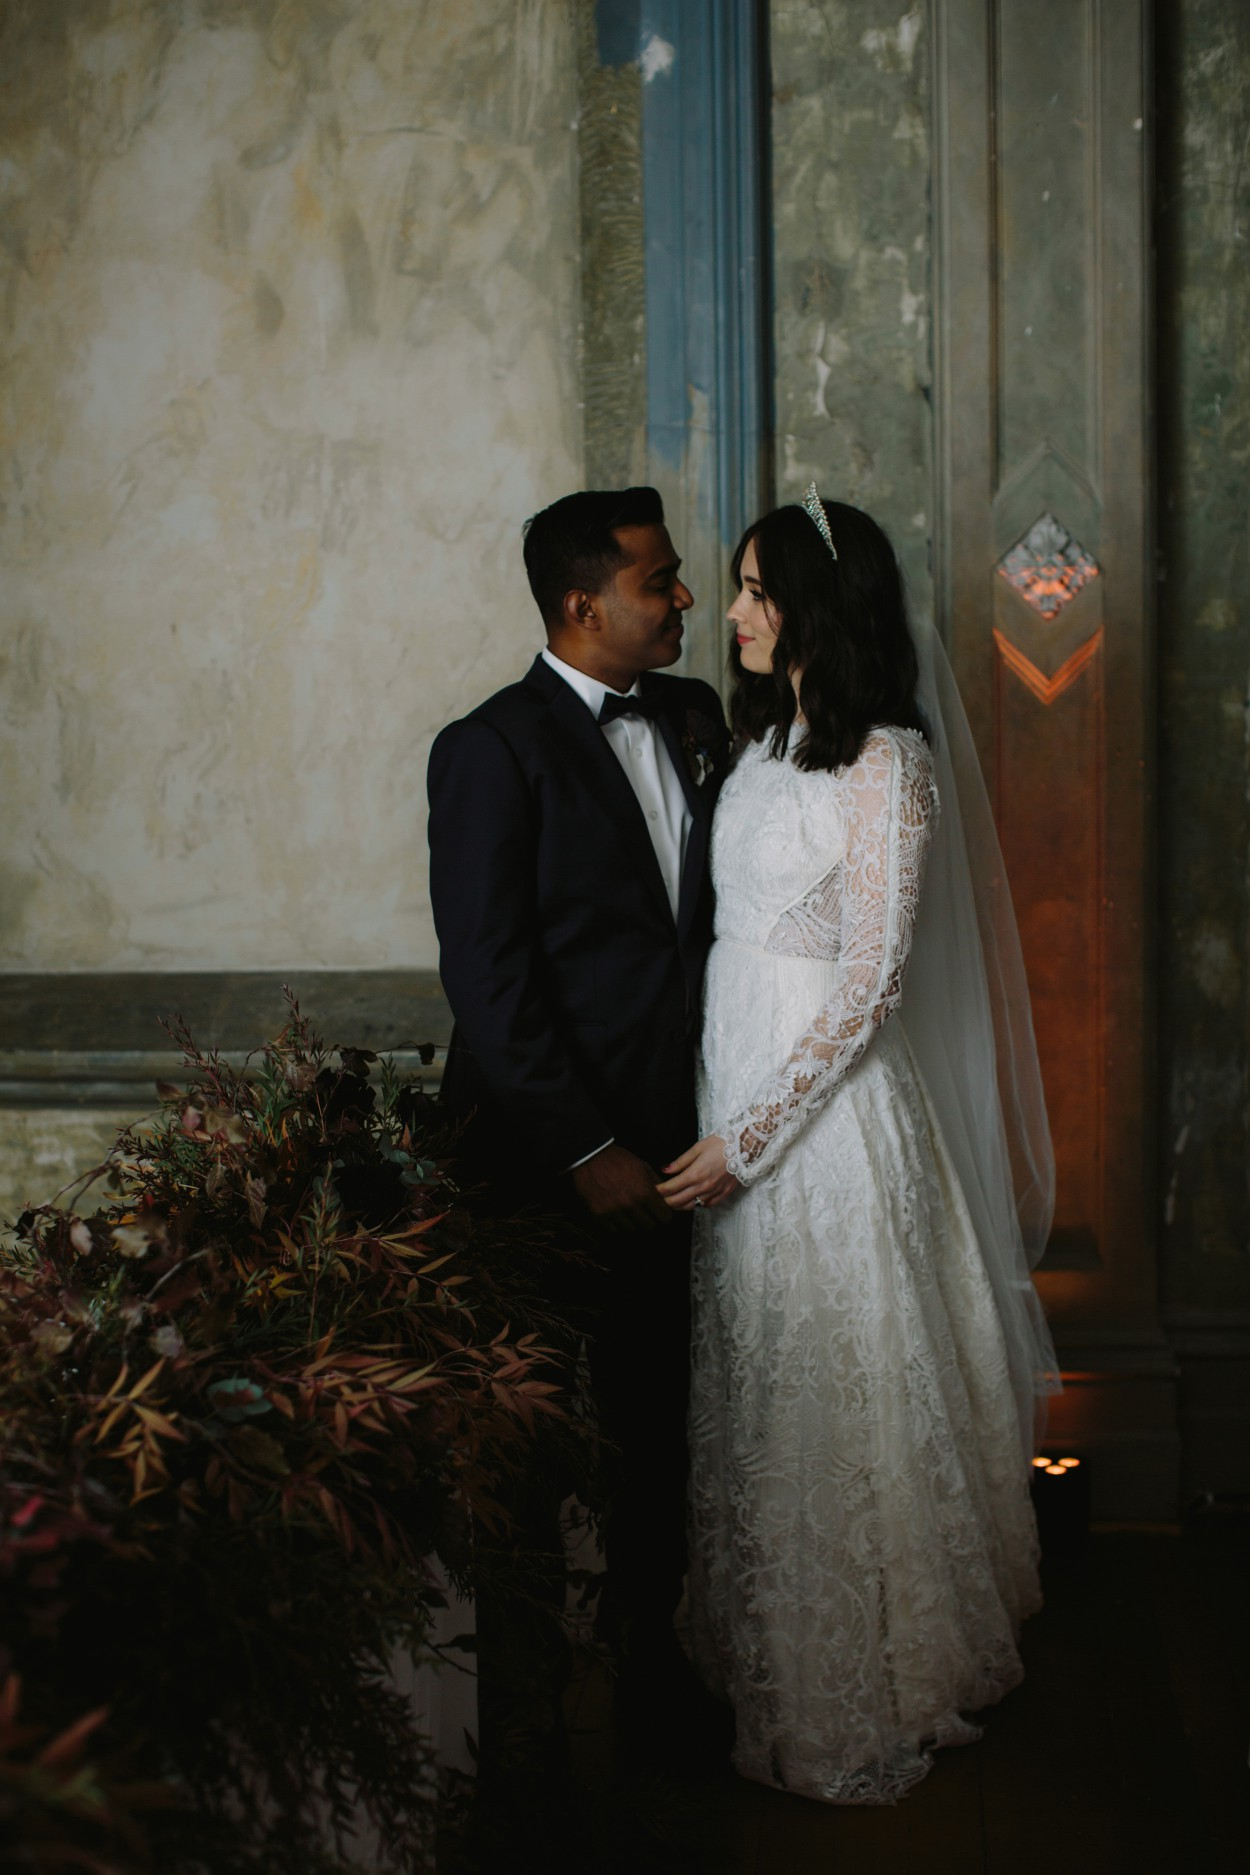 I-Got-You-Babe-Weddings-The-093George-Ballroom-St-Kilda-Wedding-Amy-Abhi.jpg